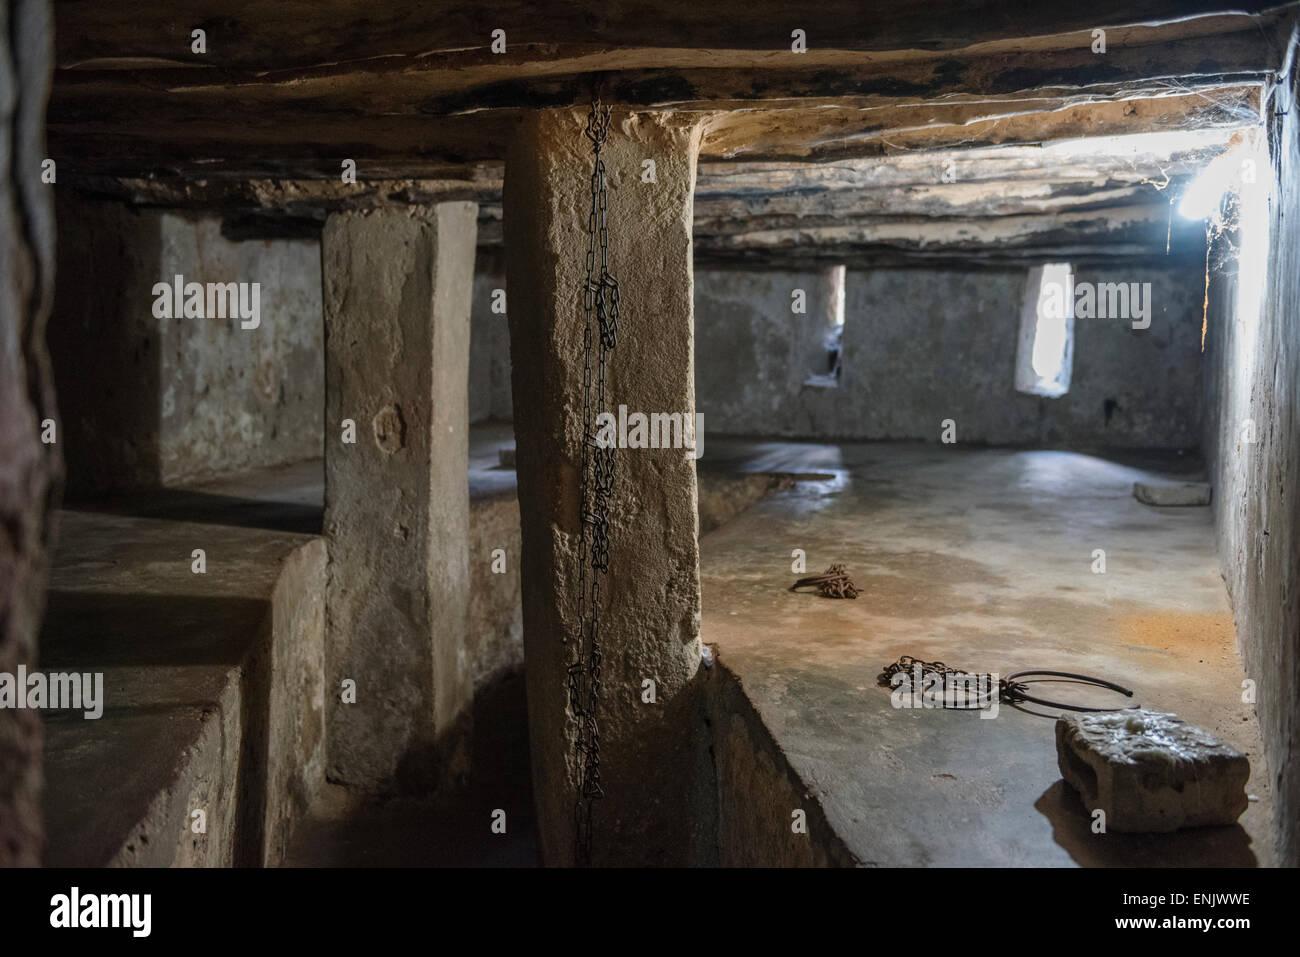 Slave prison, Zanzibar, Stone Town, Unguja, Zanzibar Archipelago, Tanzania - Stock Image